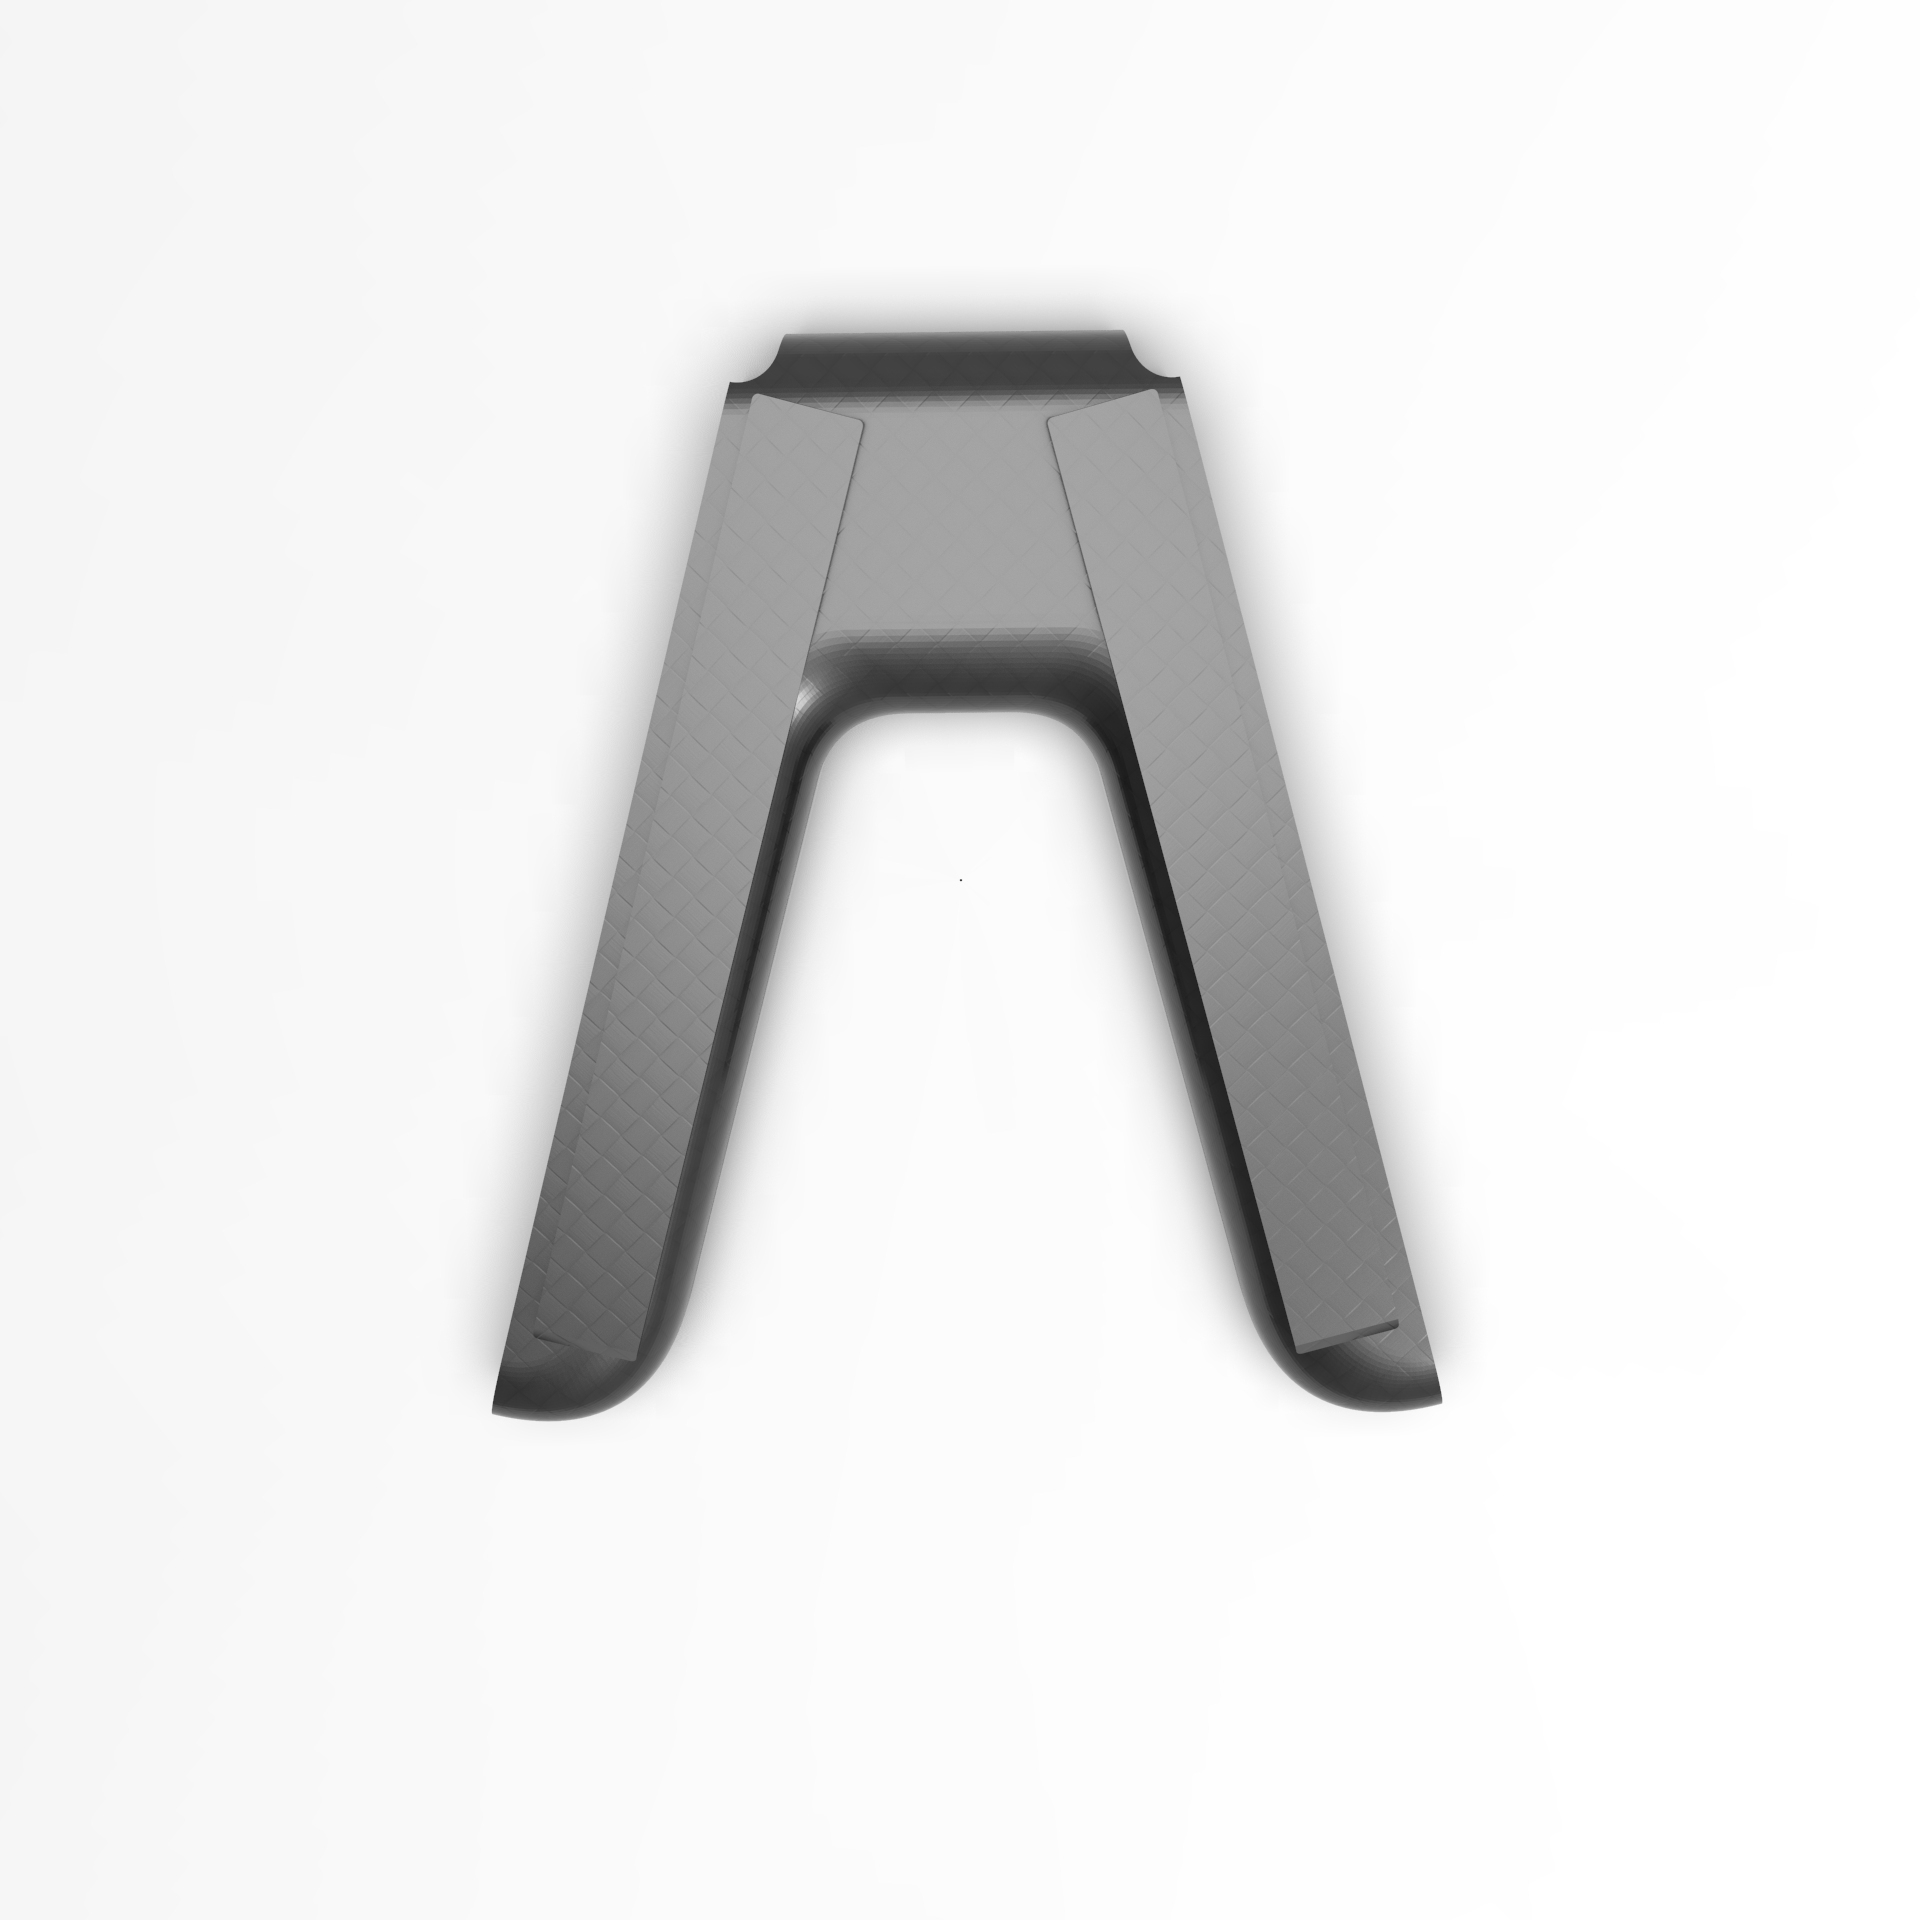 untitled.320.jpg Download free STL file Support control joycon nintendo switch • 3D printer model, CastleDesignChile